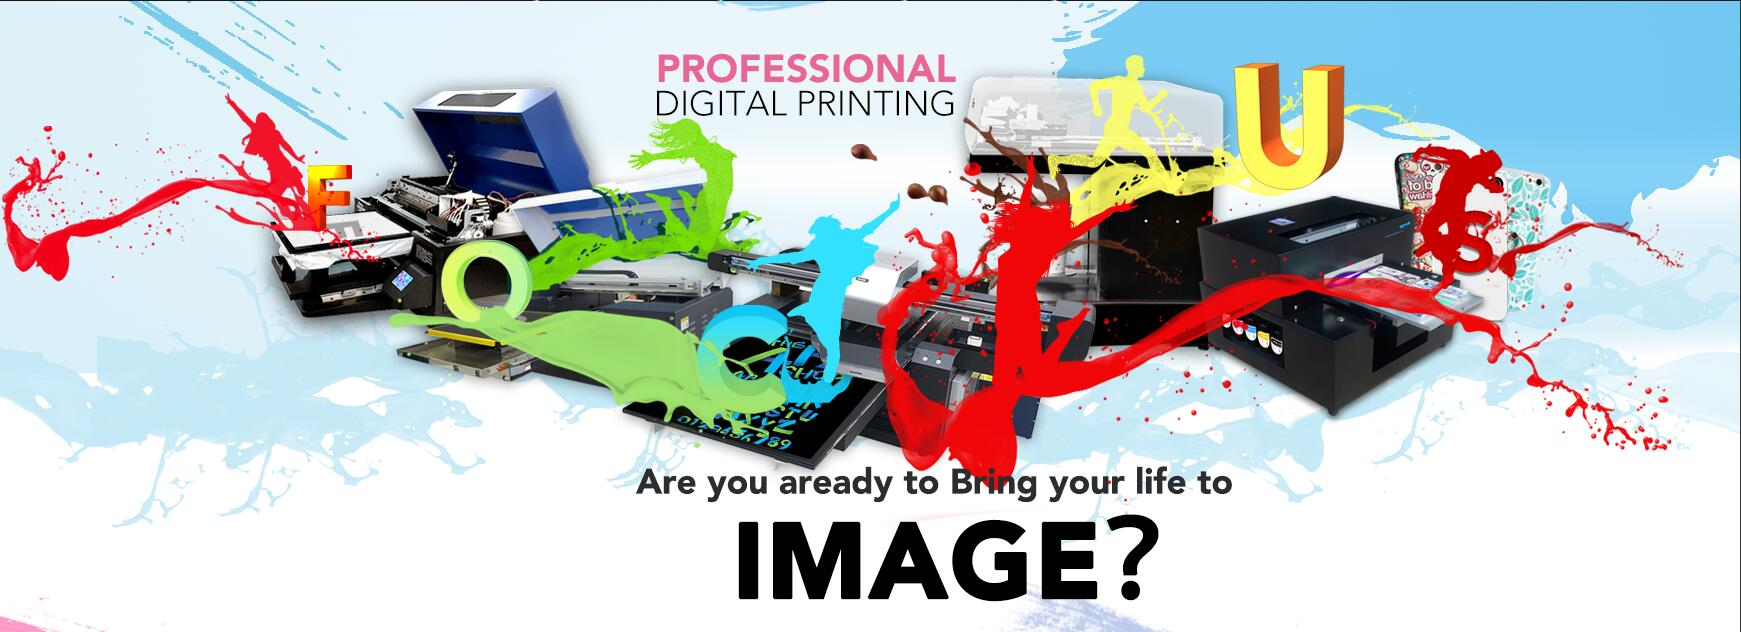 New Condition and Semi-Automatic Automatic Grade A4 flatbed printer DTG printer